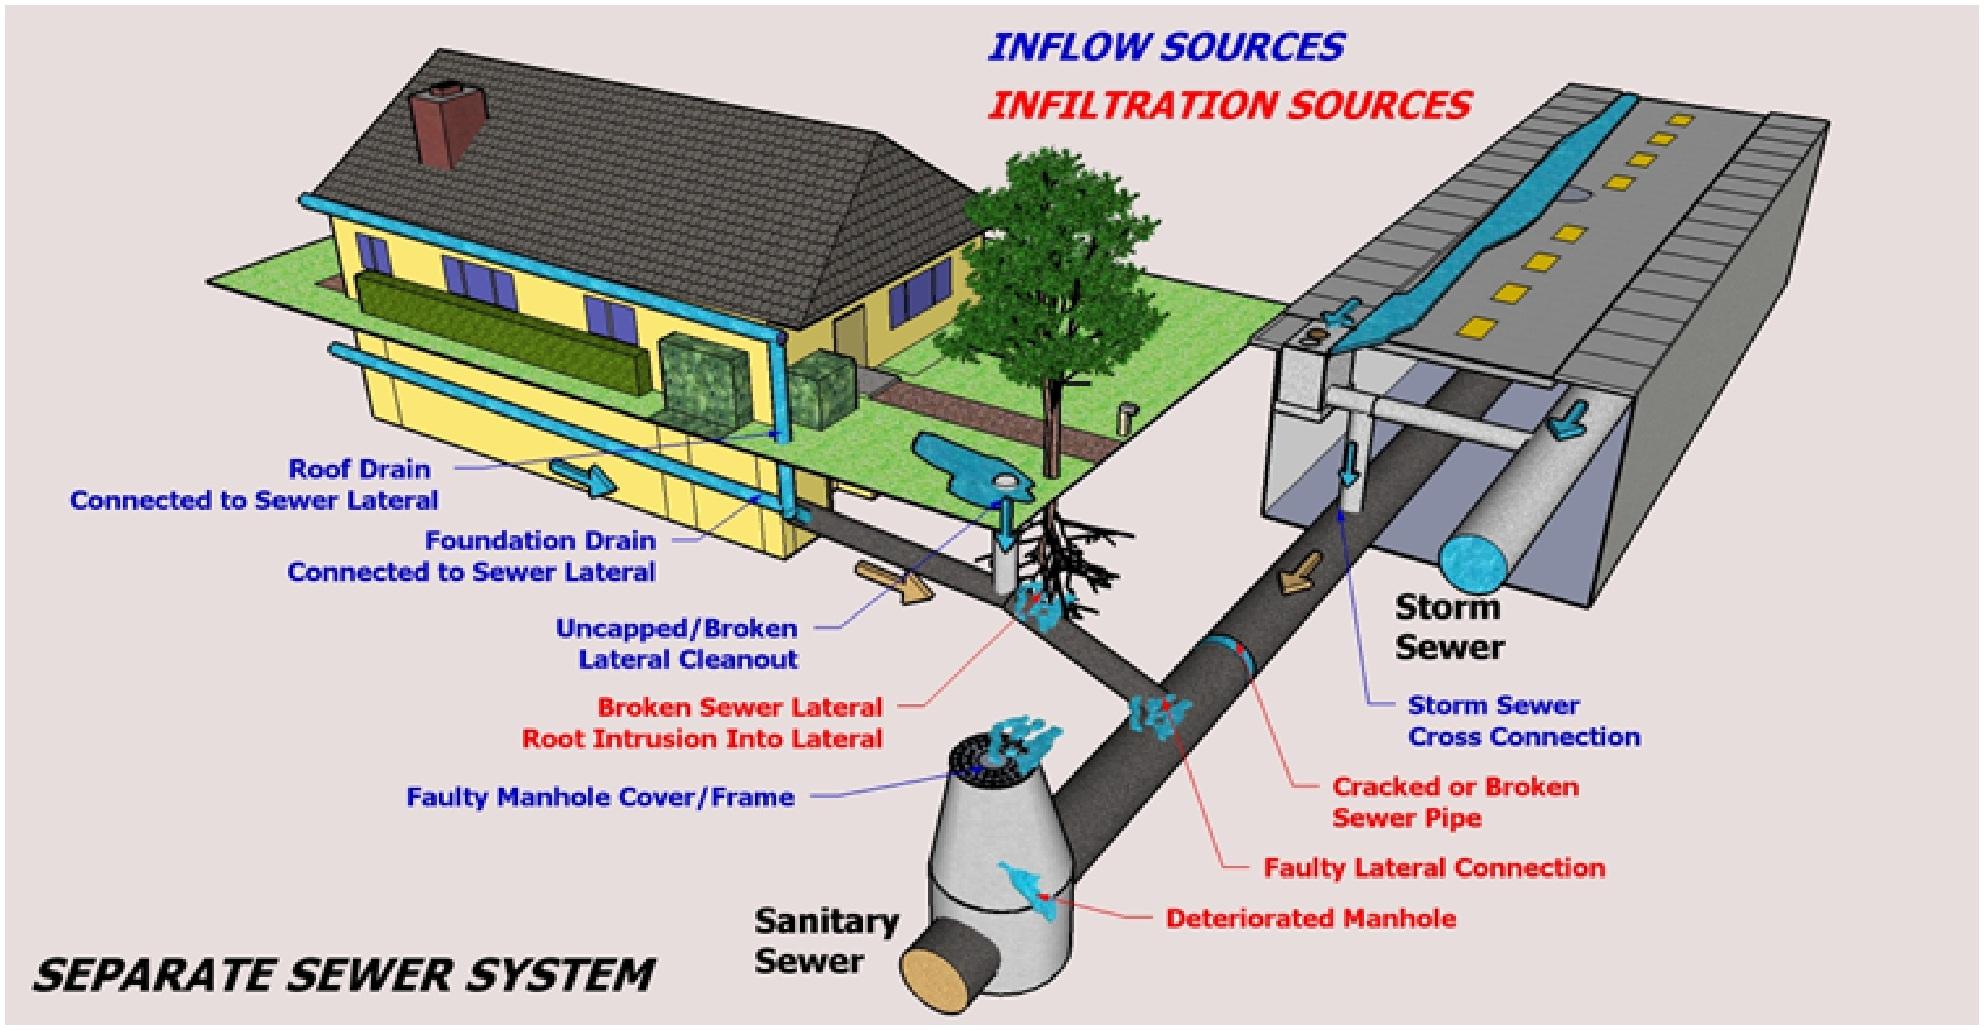 shurflo rv water pump wiring diagram 2009 kia rio radio pipe network design - acpfoto